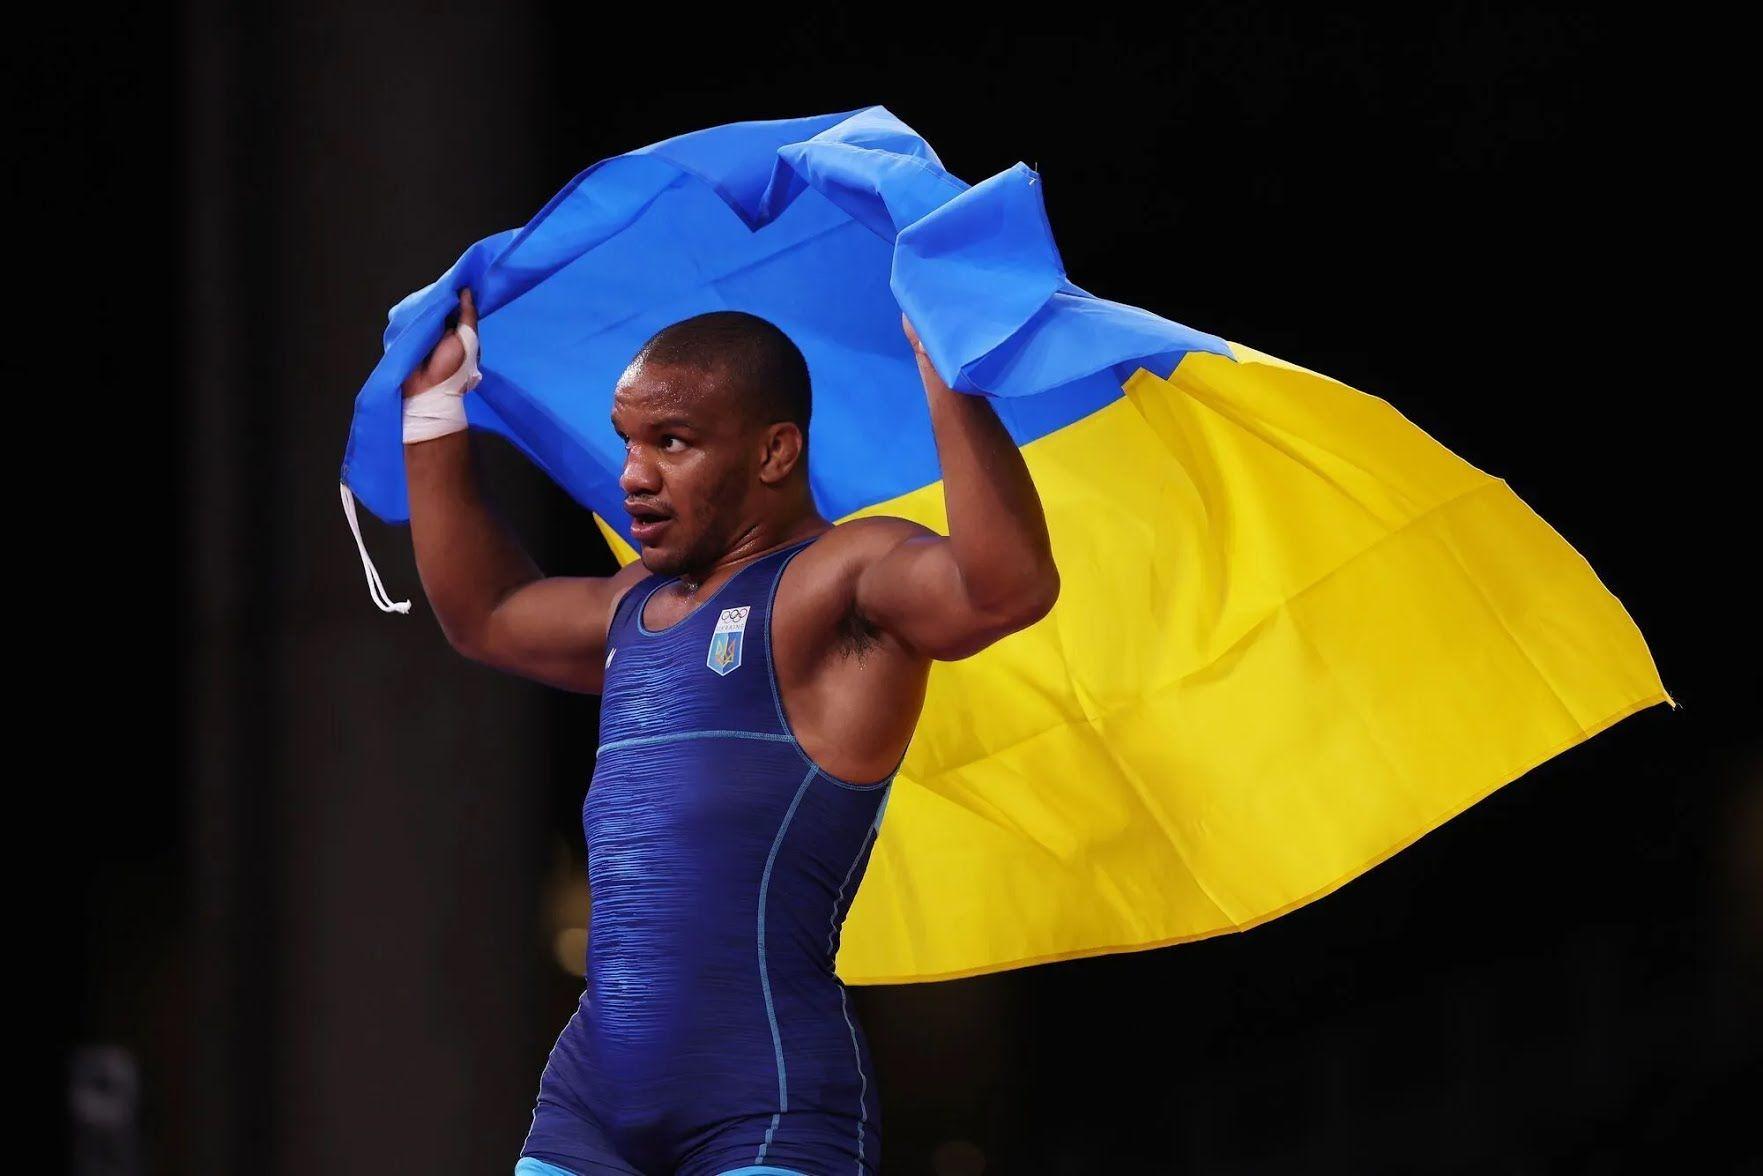 Жан Беленюк з прапором України